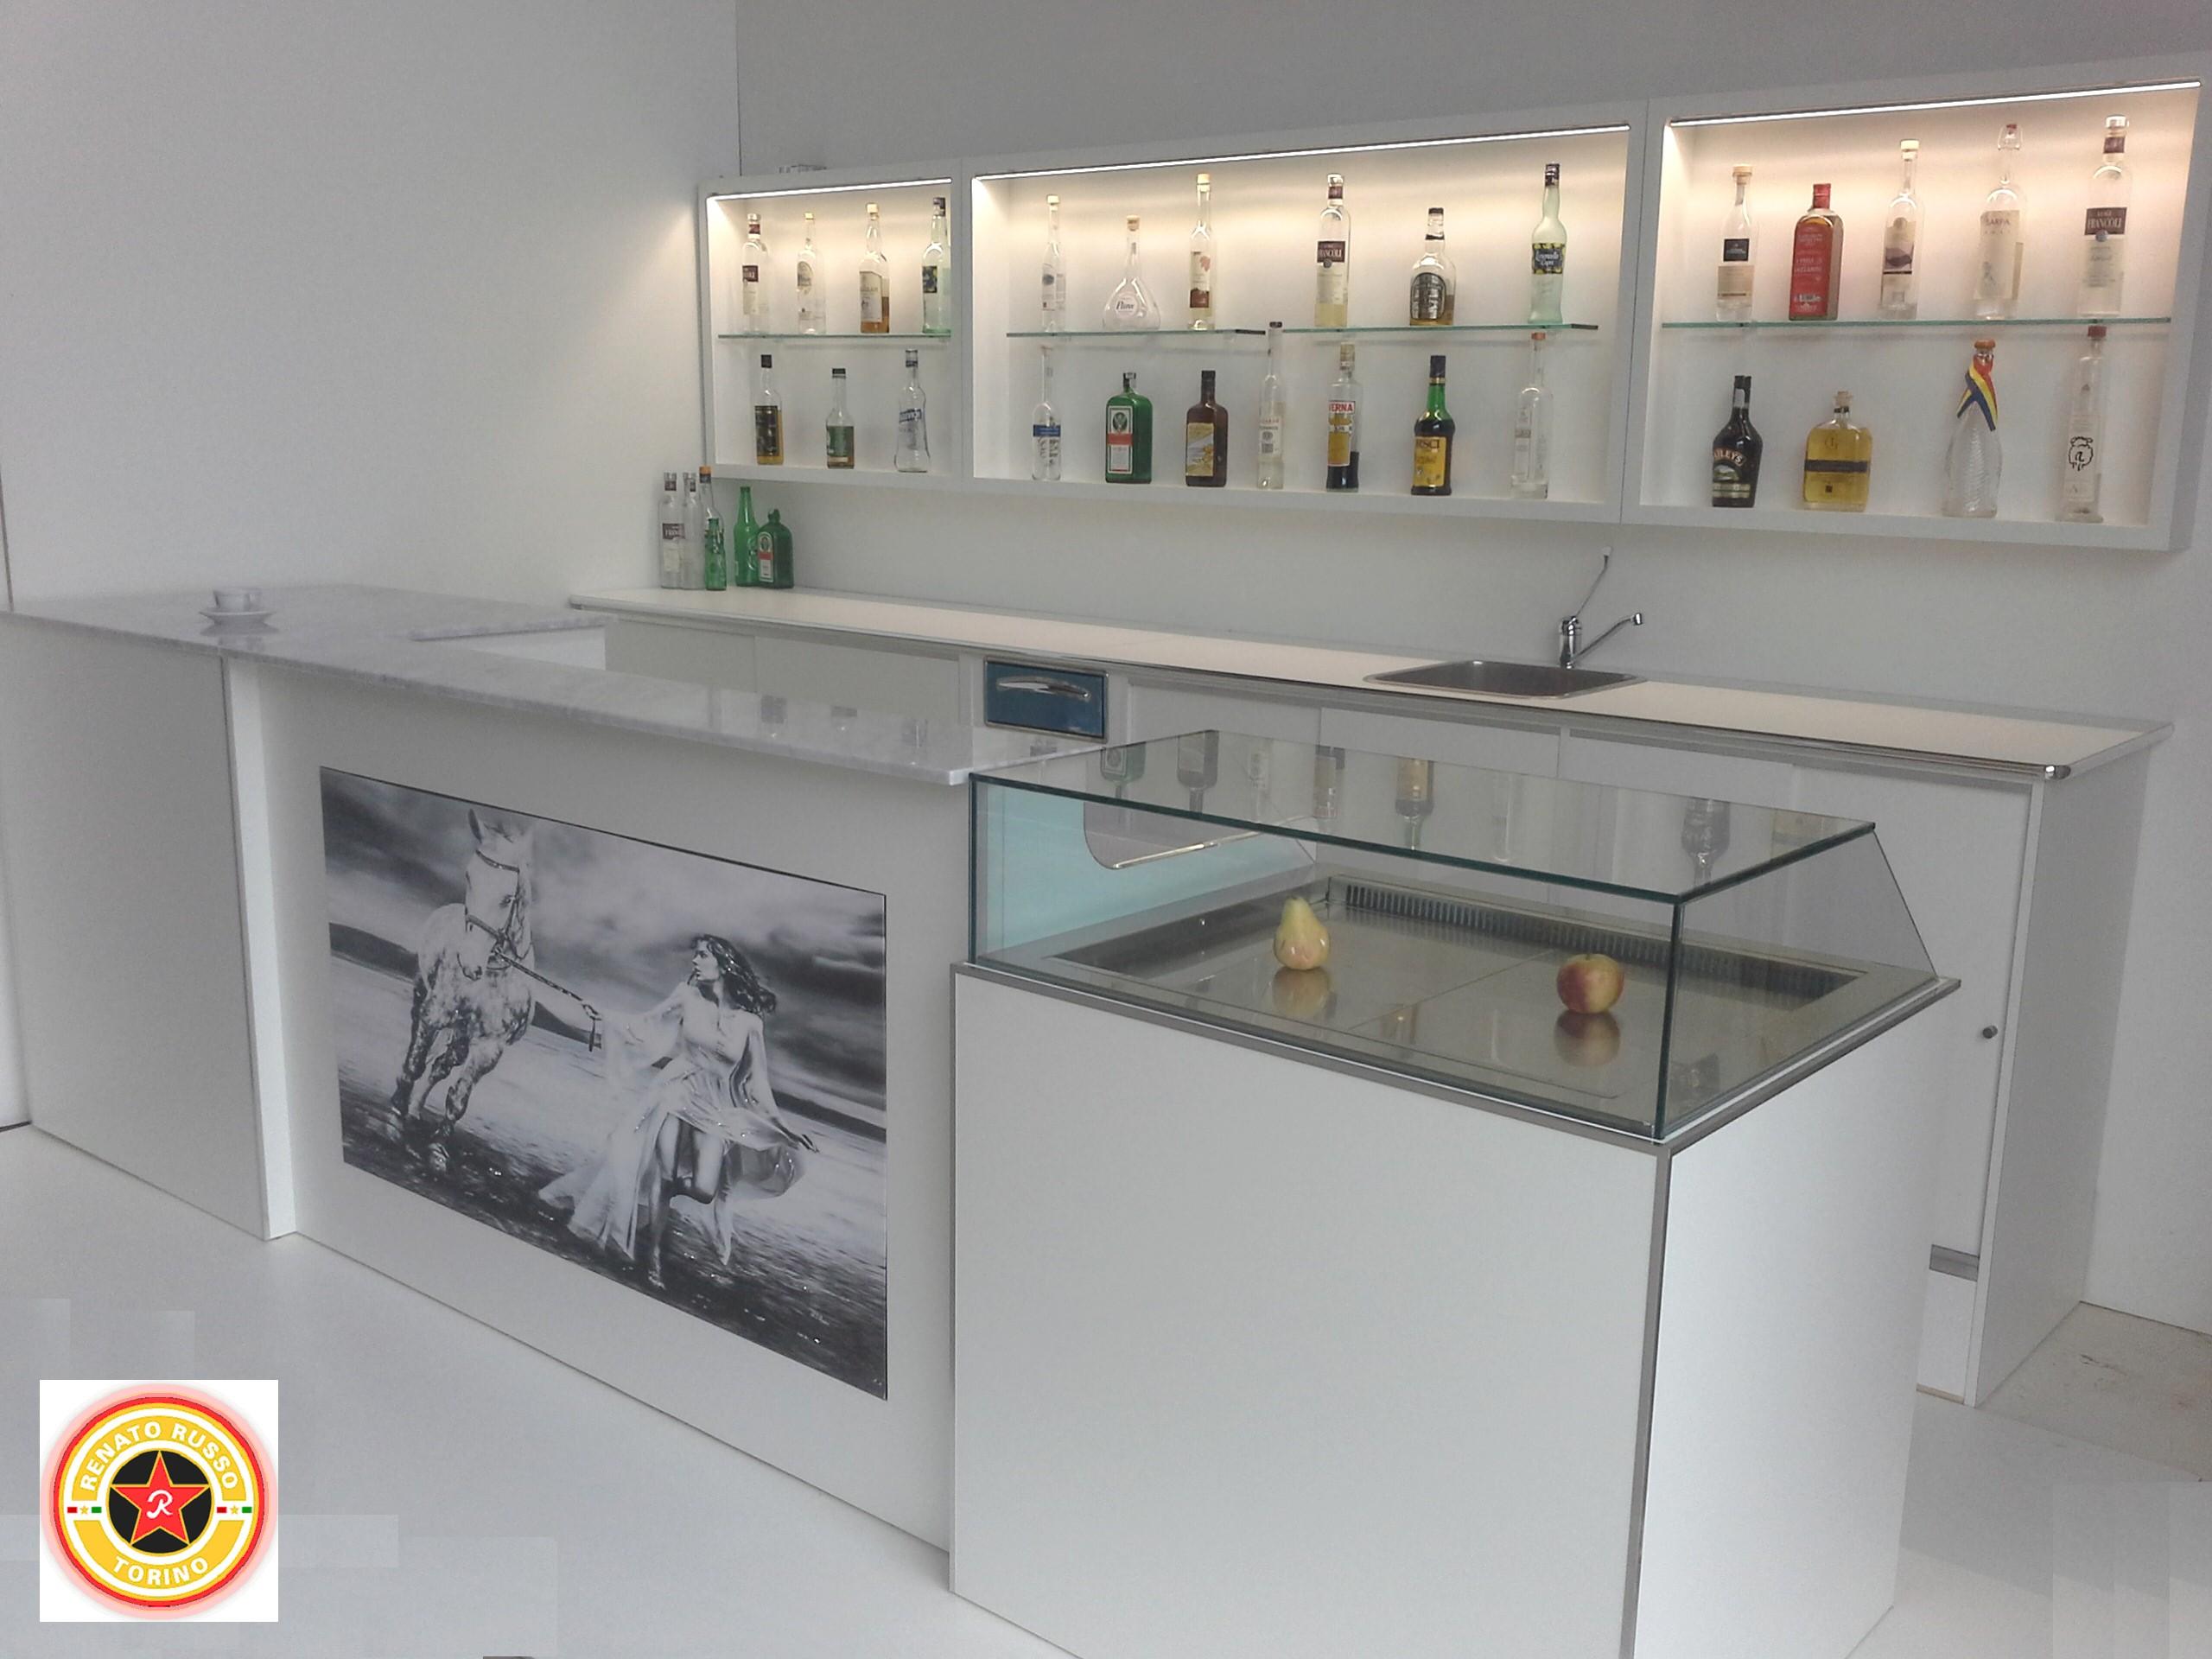 Prezzi Banchi Bar Roma, COMPRA in FABBRICA, Banconi Bar, Produttori ...